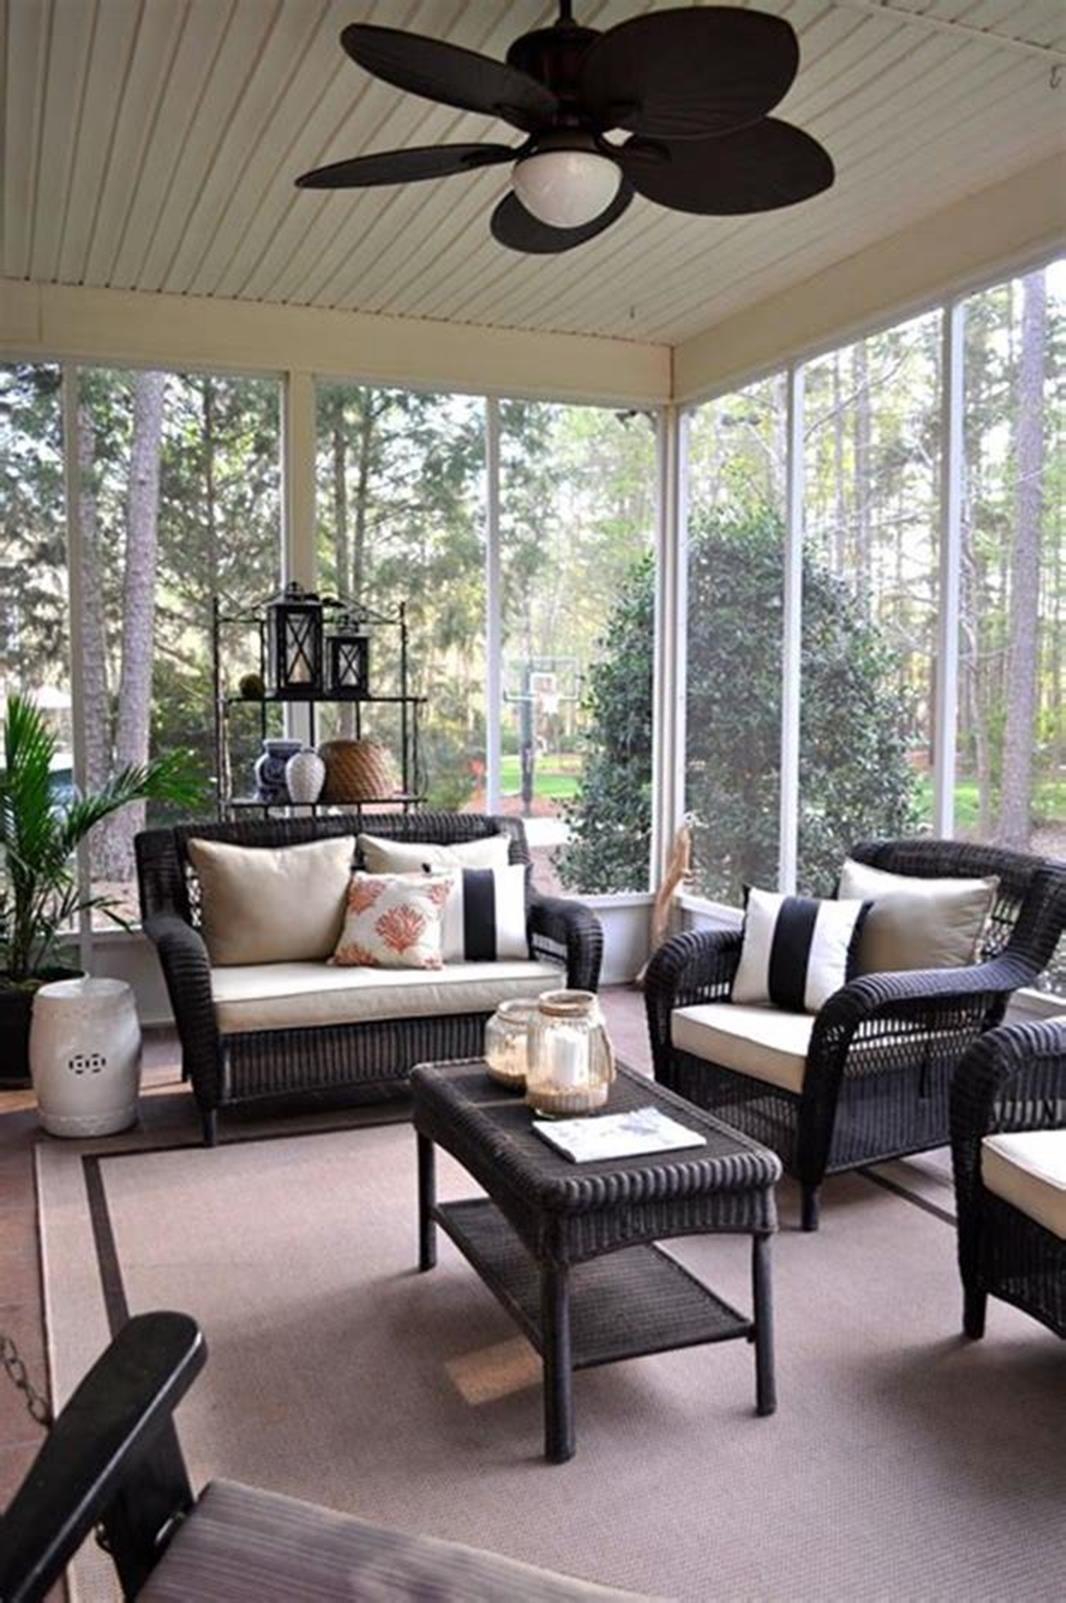 Best 45 Cheap Sunroom Furniture Ideas   Sunroom decorating ... on Cheap Patio Enclosure Ideas  id=89394